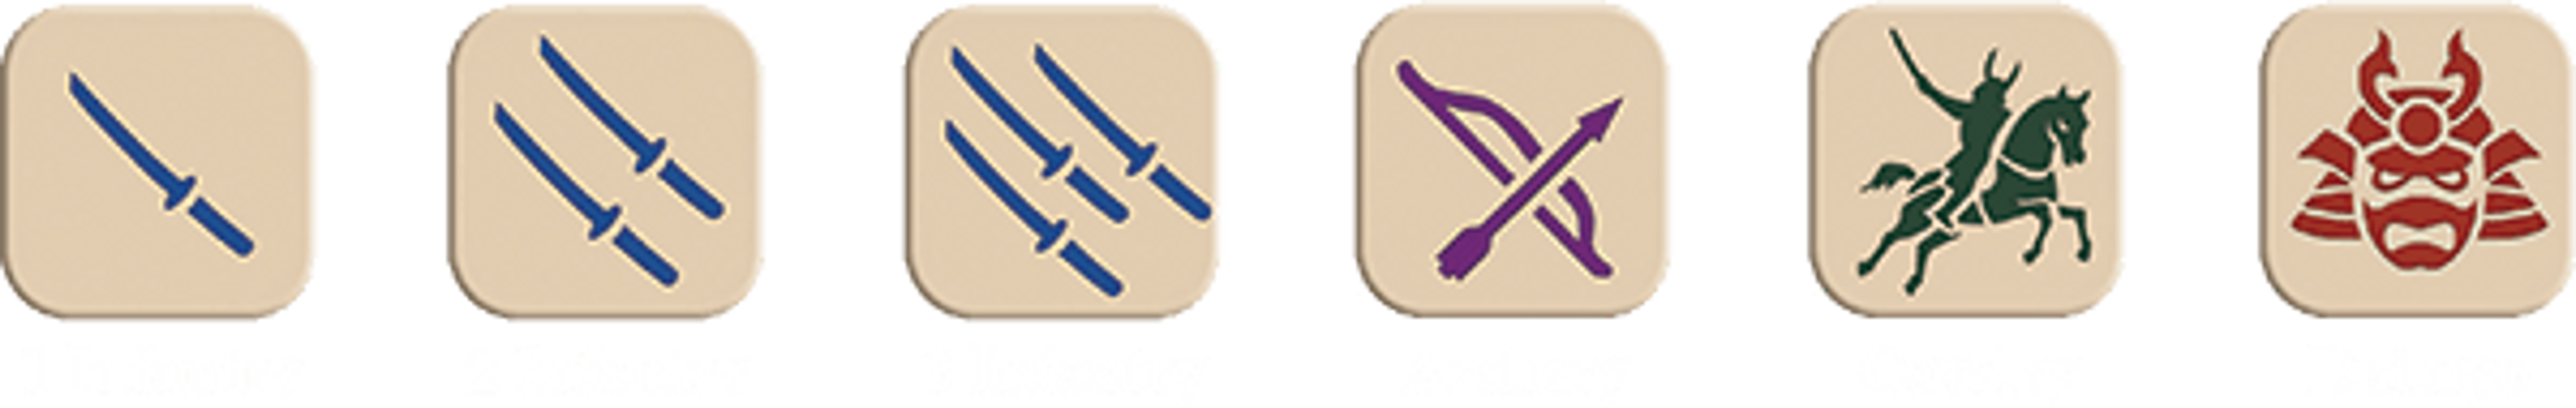 Age of War dice